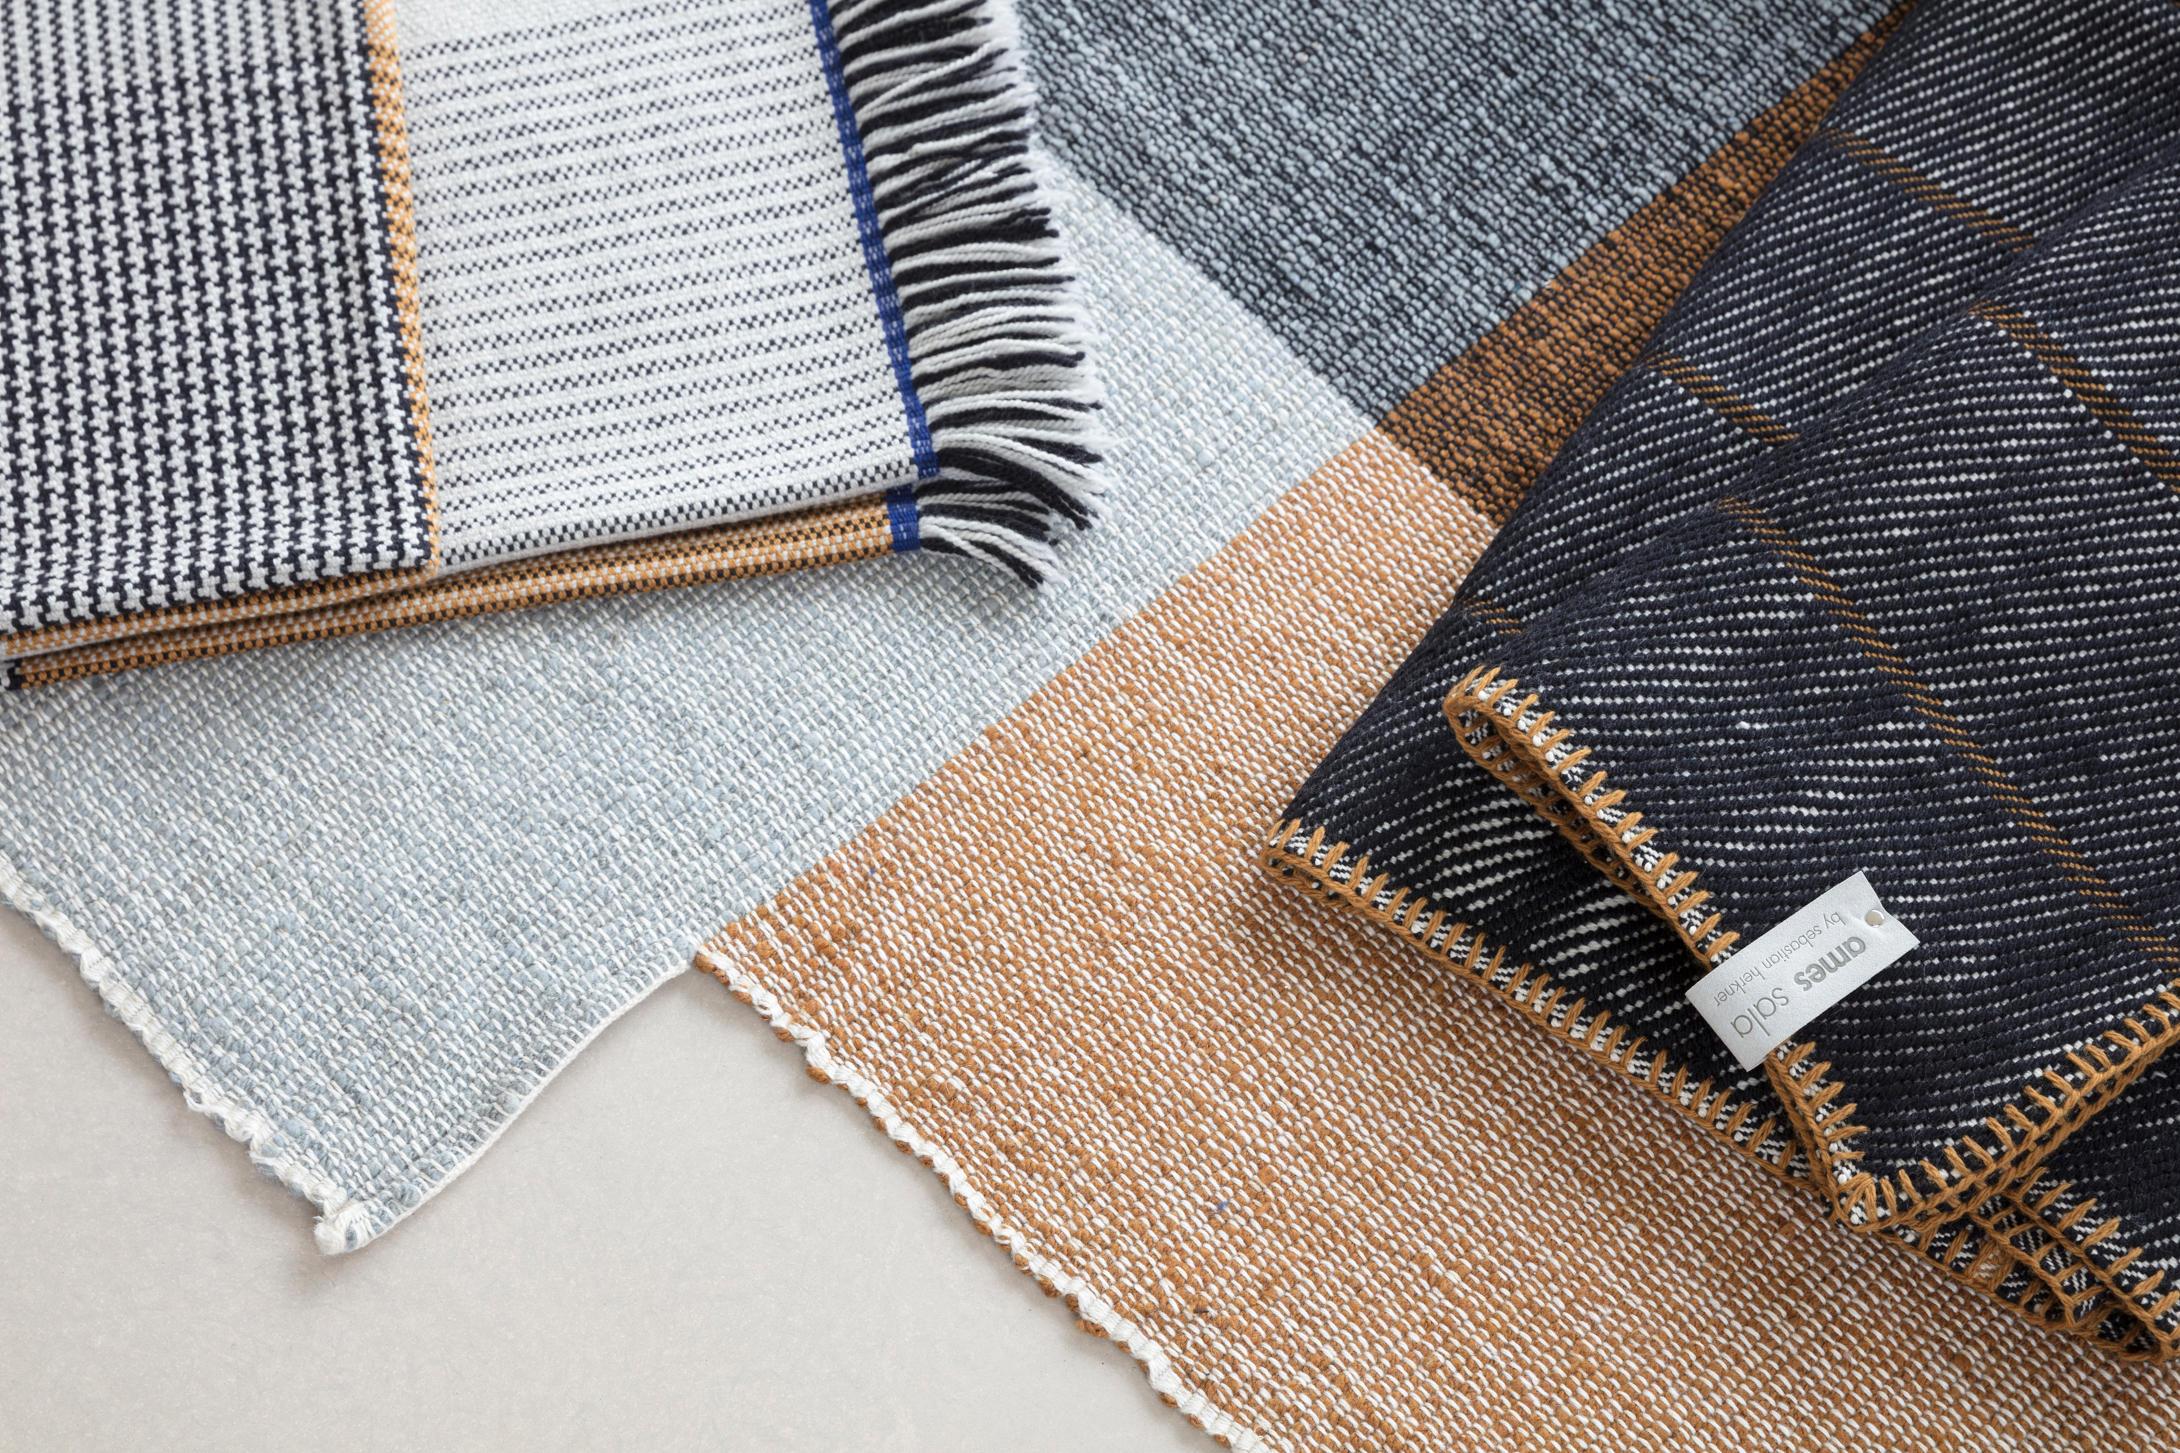 nobsa teppich gro grau grau creme formatteppiche. Black Bedroom Furniture Sets. Home Design Ideas